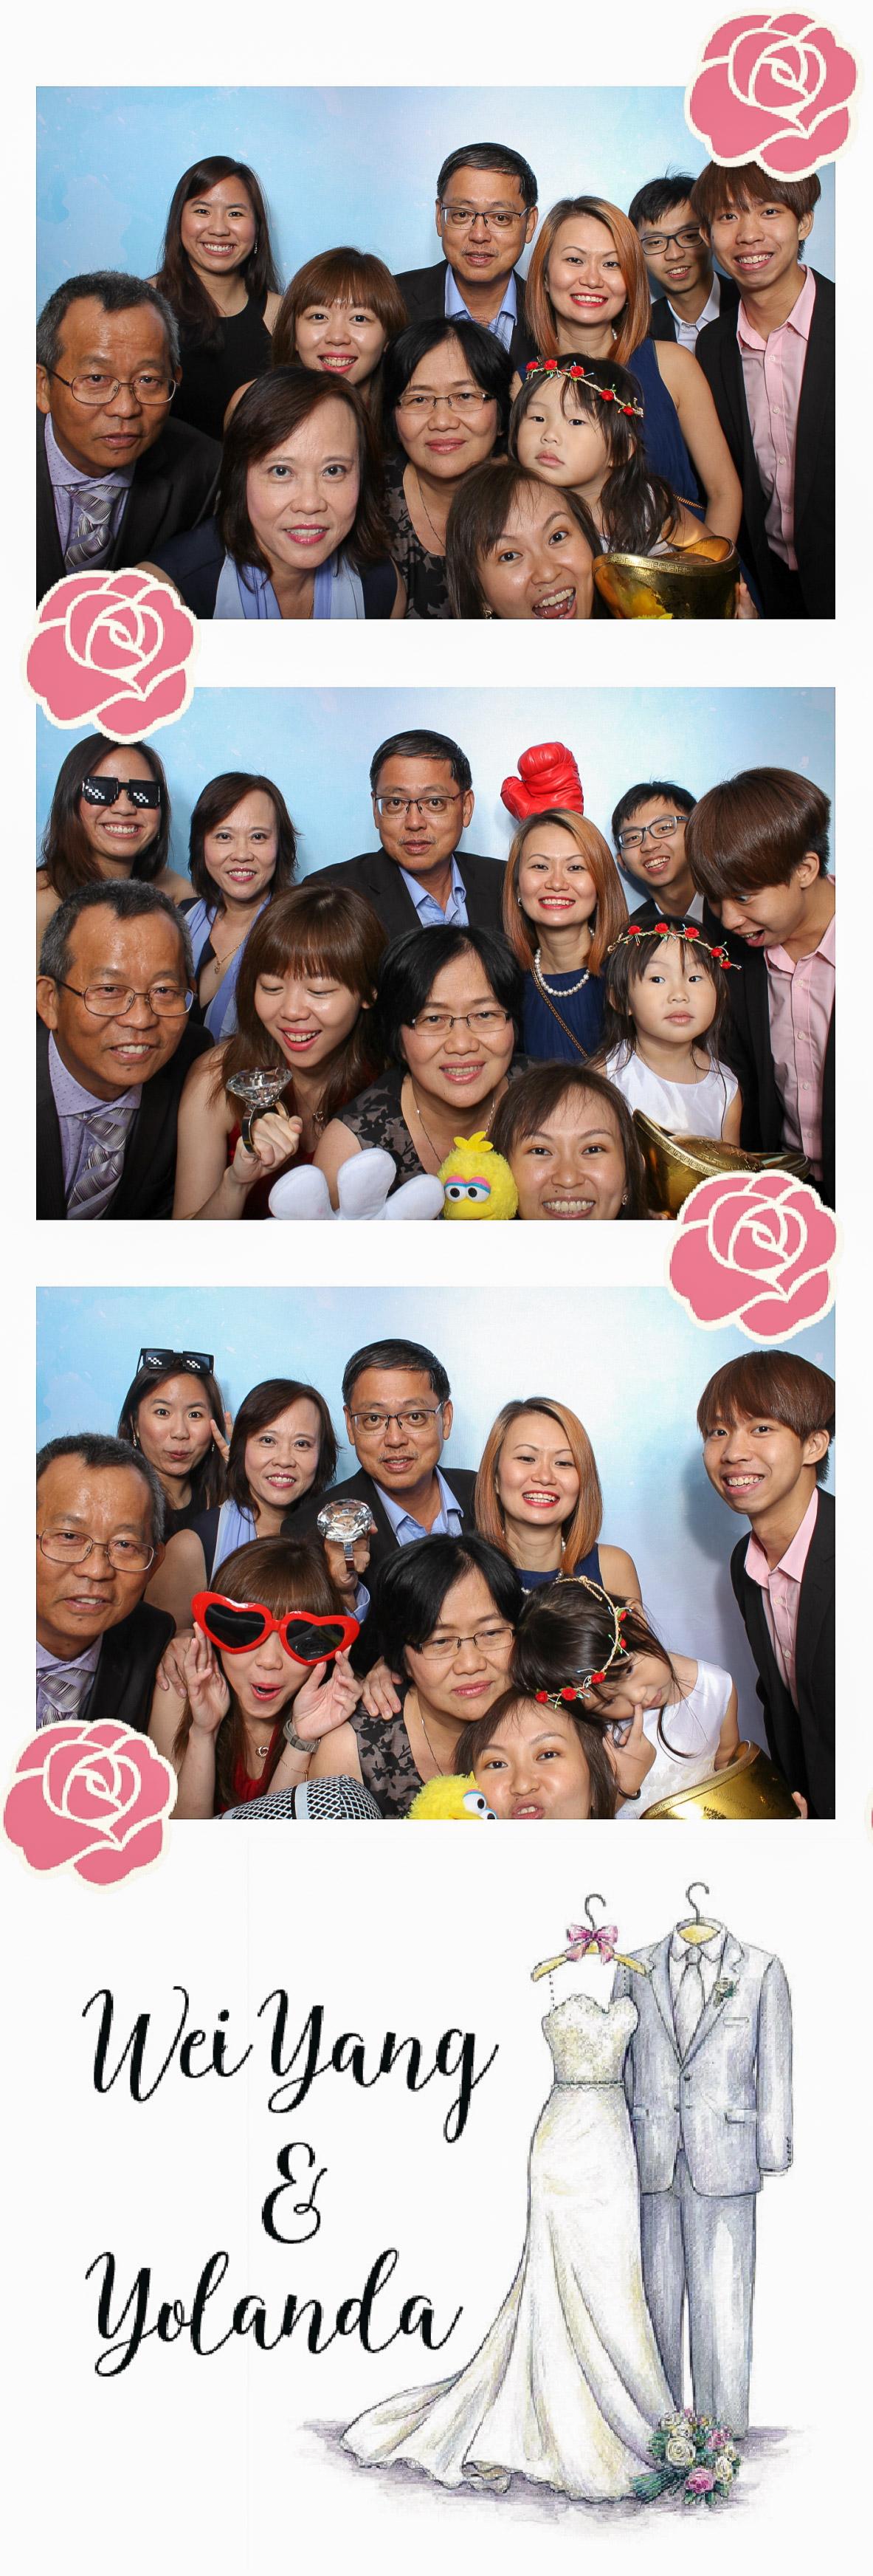 Photobooth 1706-52